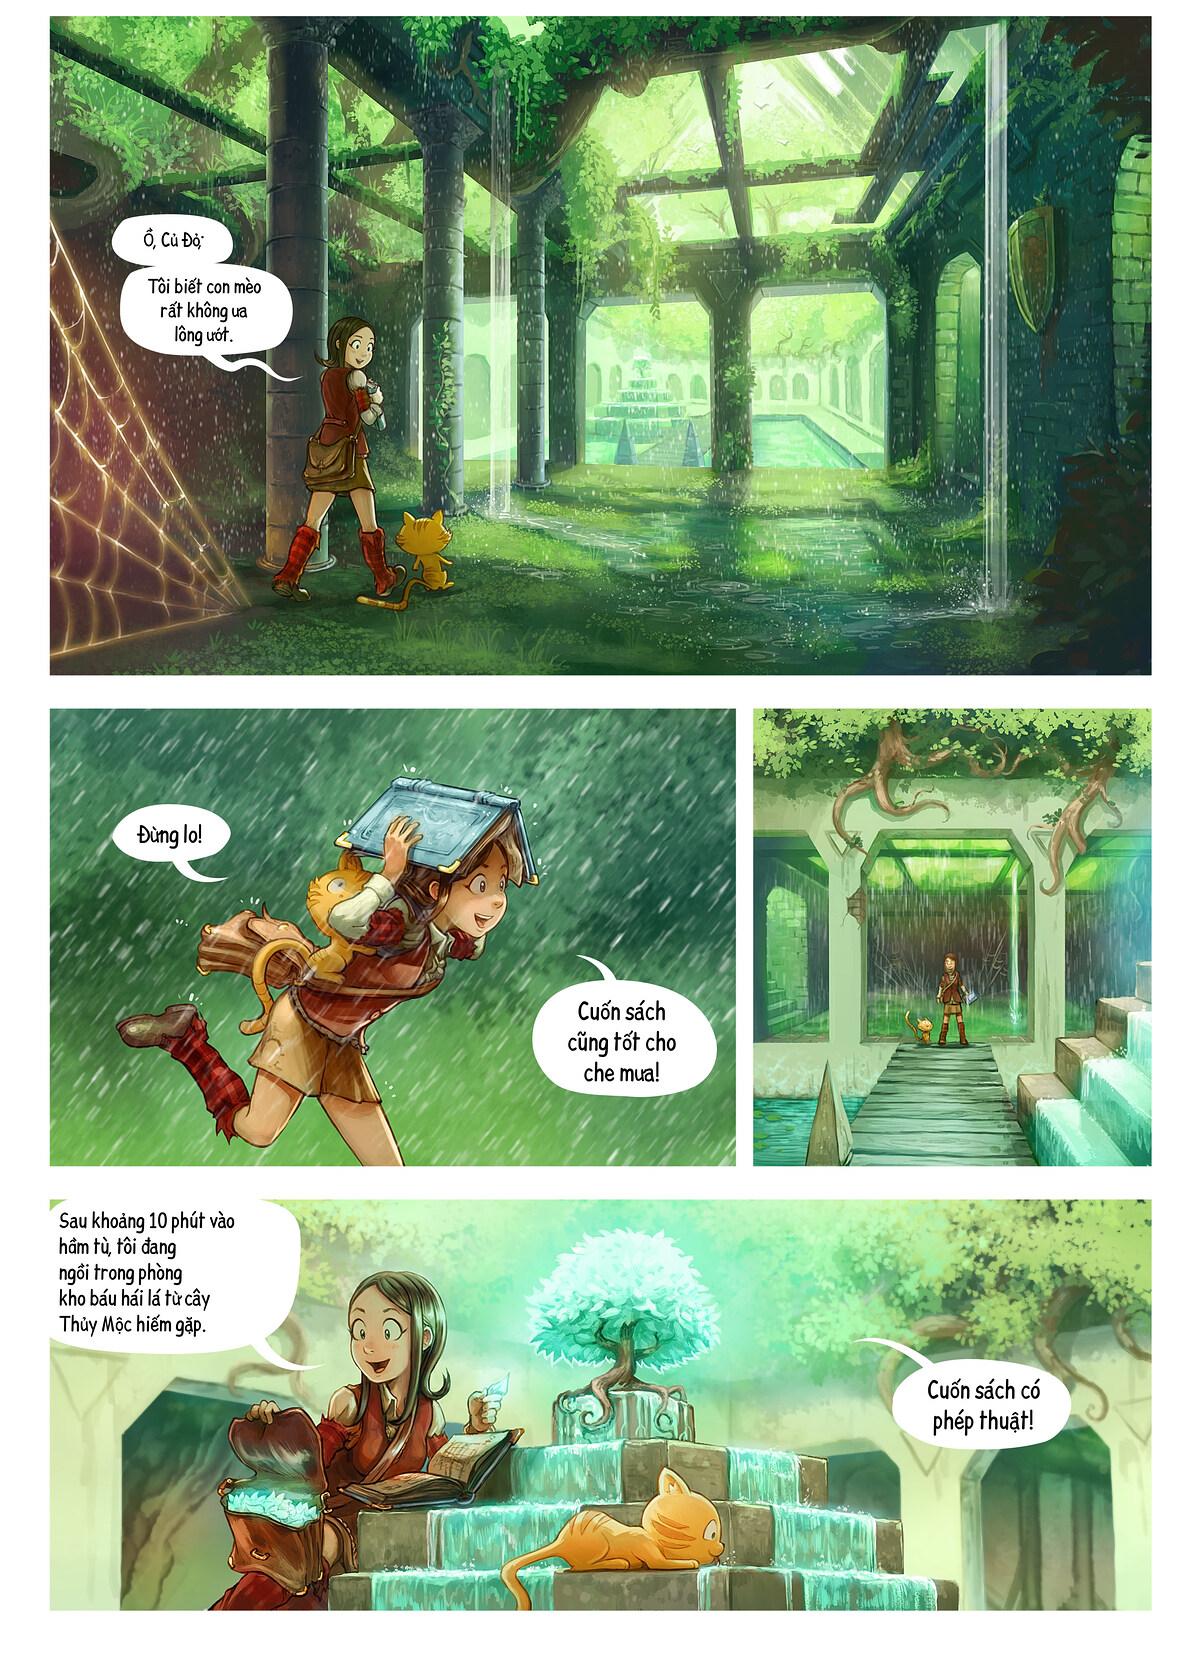 A webcomic page of Pepper&Carrot, Tập 26 [vi], trang 3